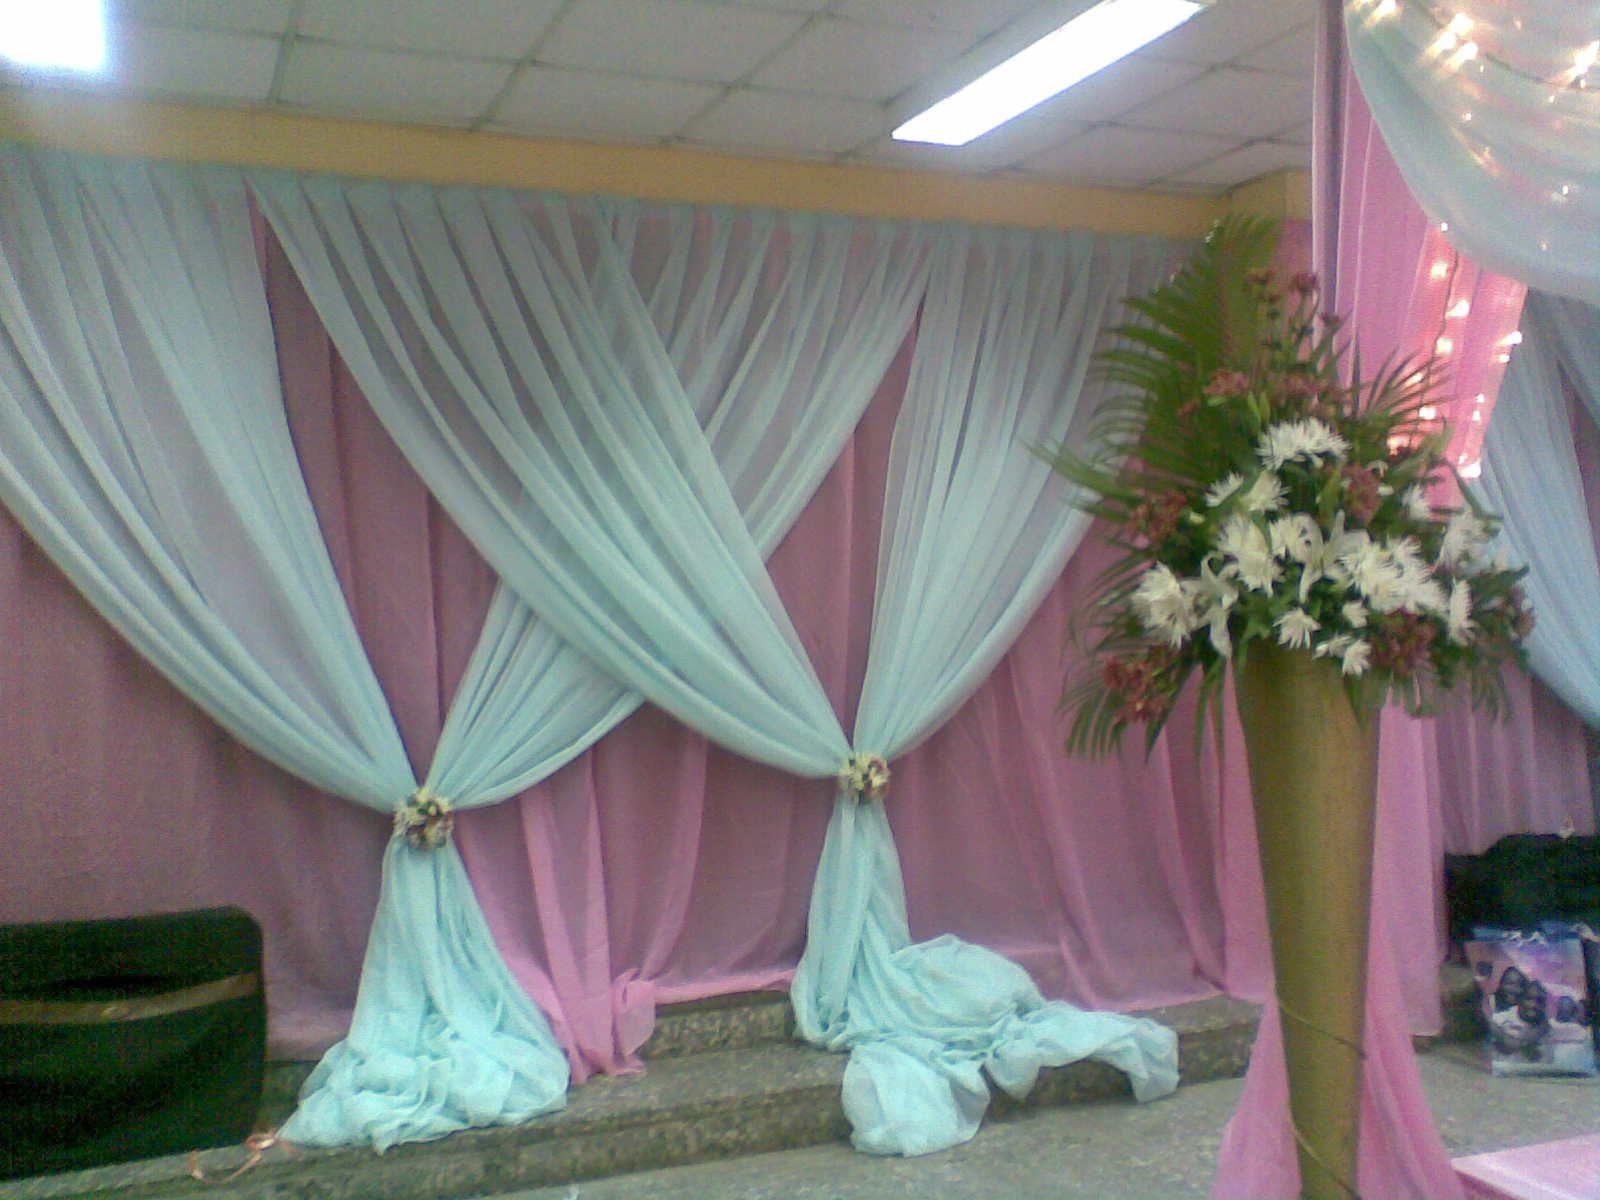 Kings event interior decoration wedding decorations kings event interior decoration wedding decorations junglespirit Images